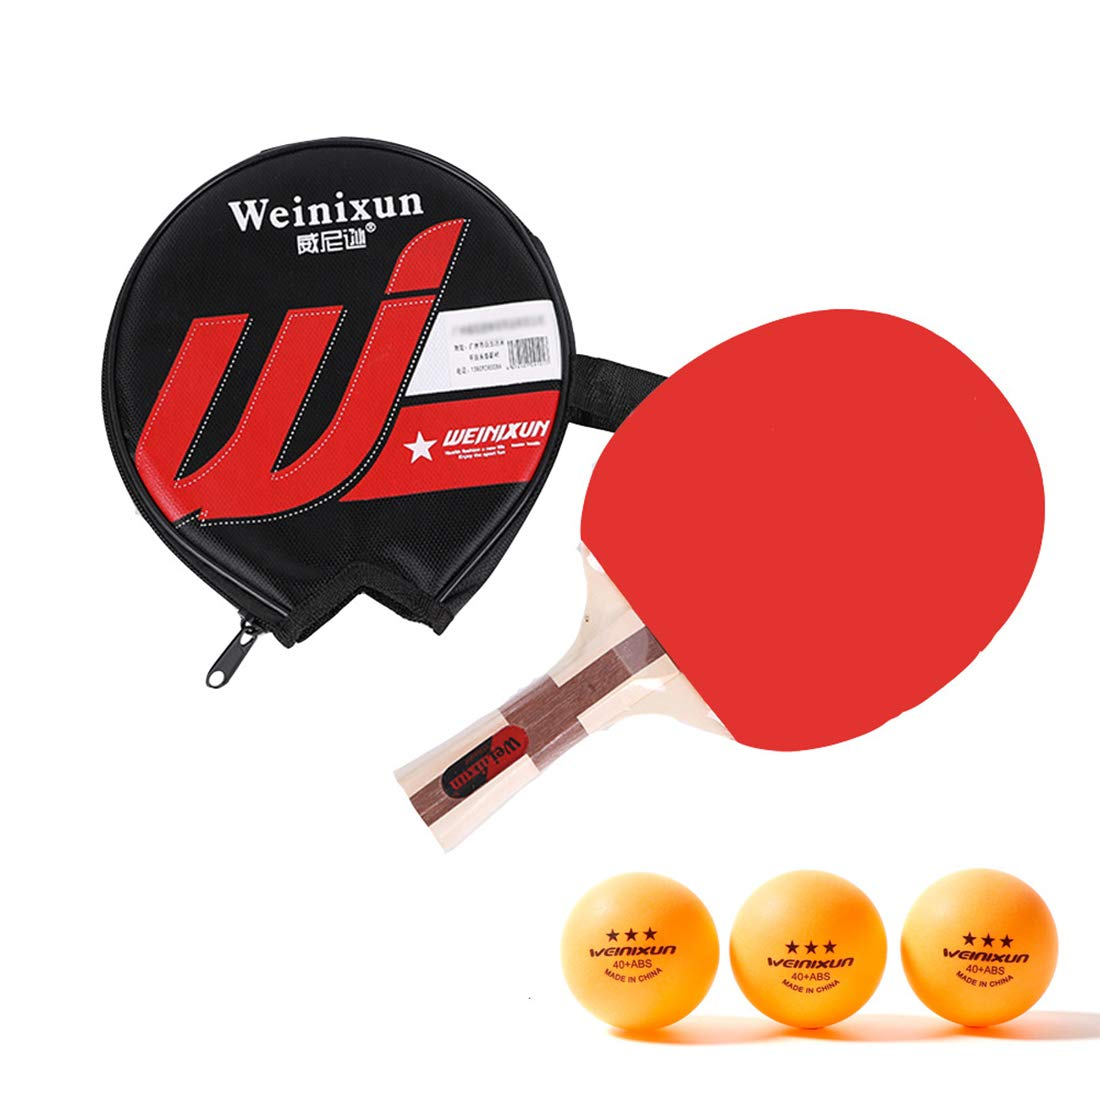 YUYAXQP PortátilPala De Ping Pong Juego De Tenis De Mesa para El ...